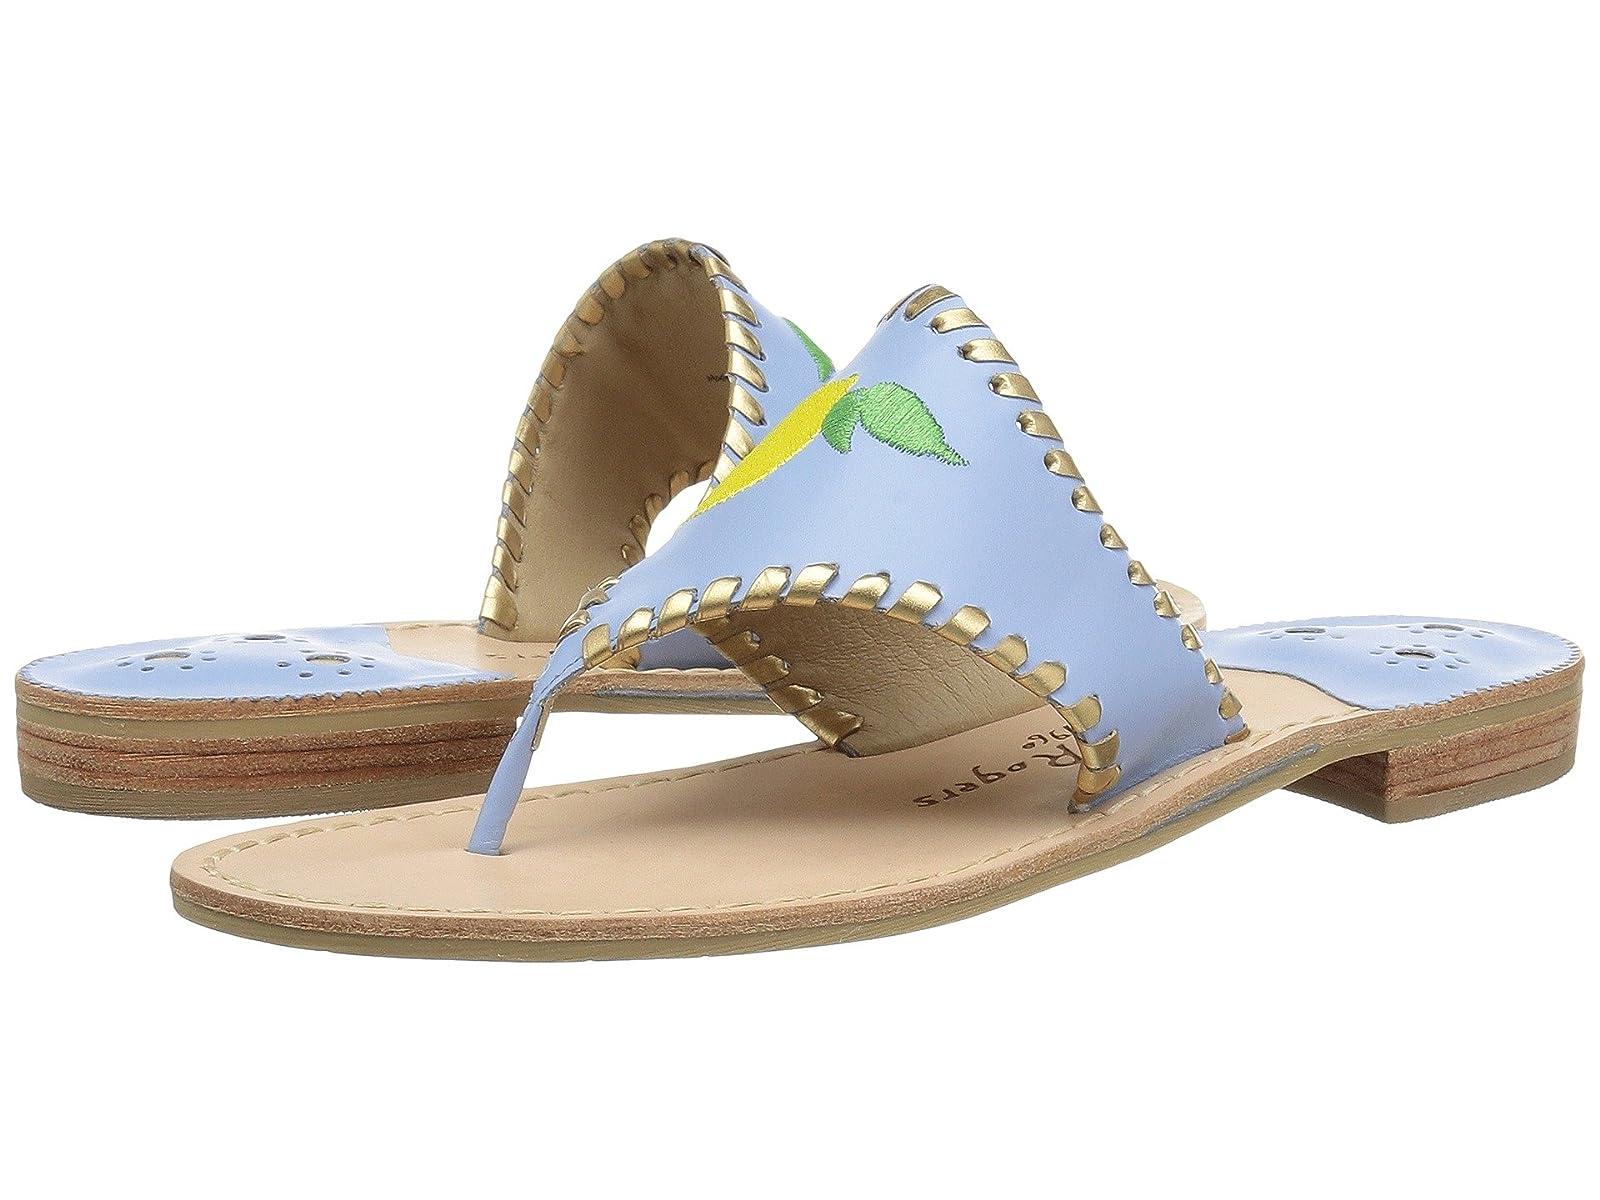 Jack Rogers LemonCheap and distinctive eye-catching shoes